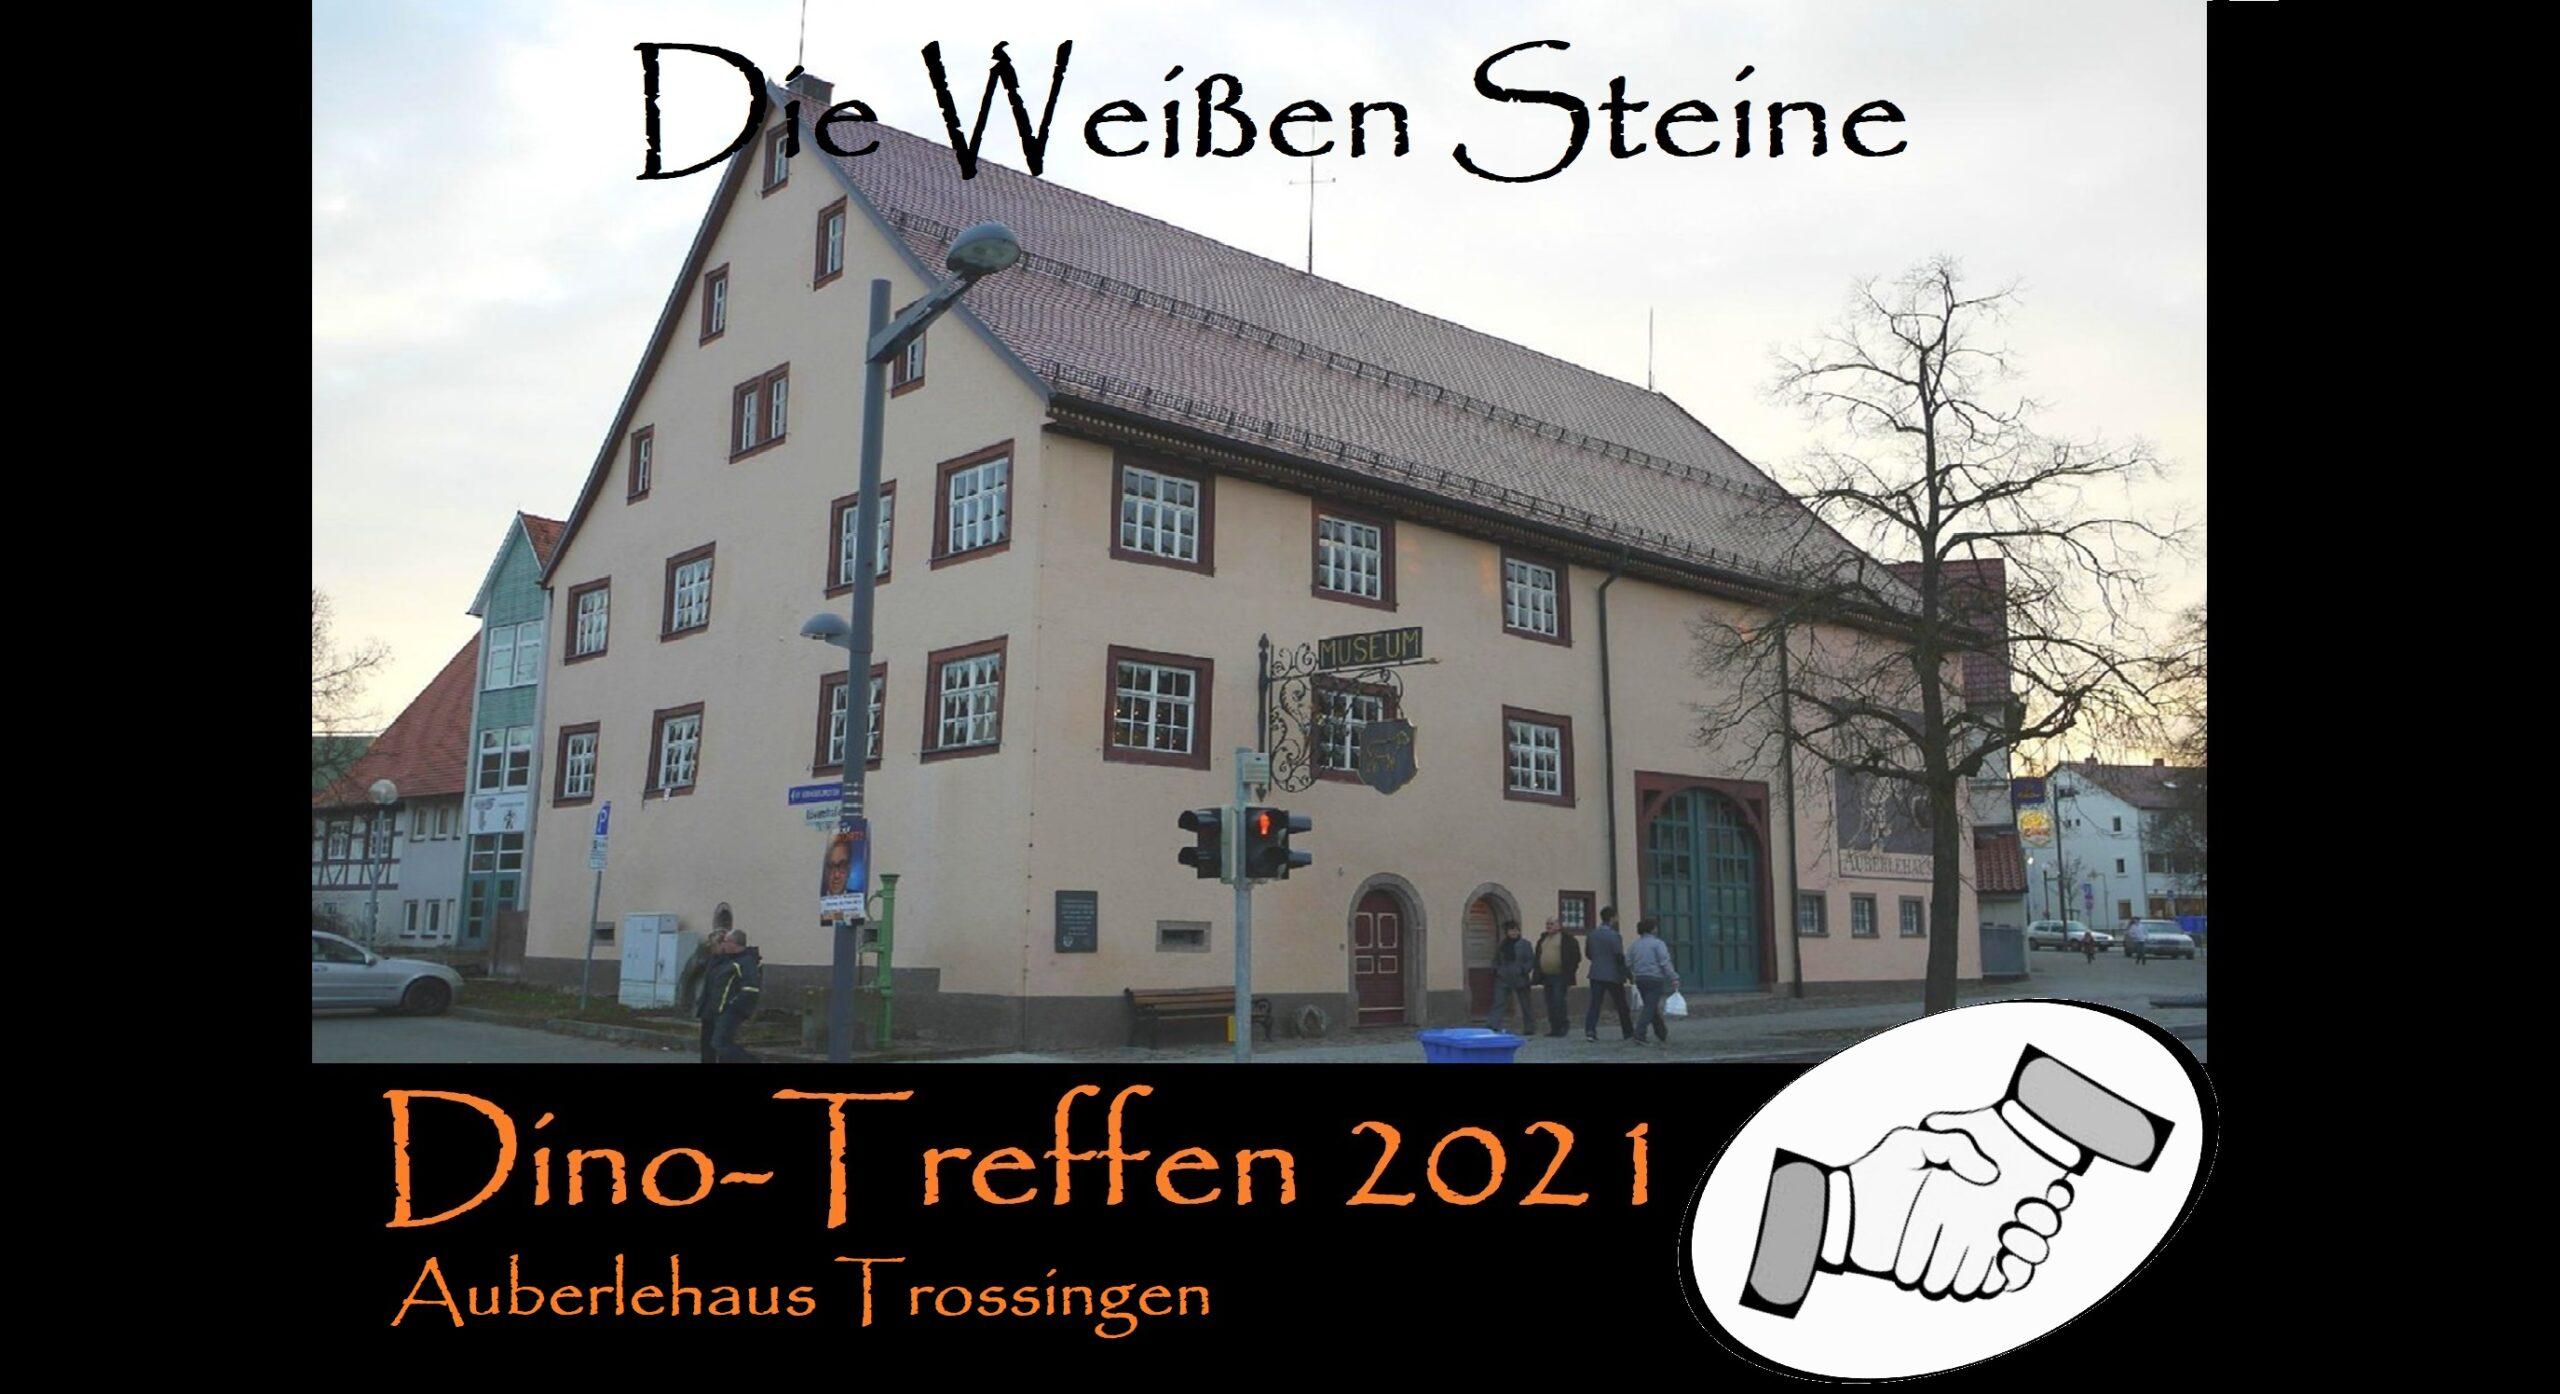 Trossingen Auberlehaus Dino-Treffen